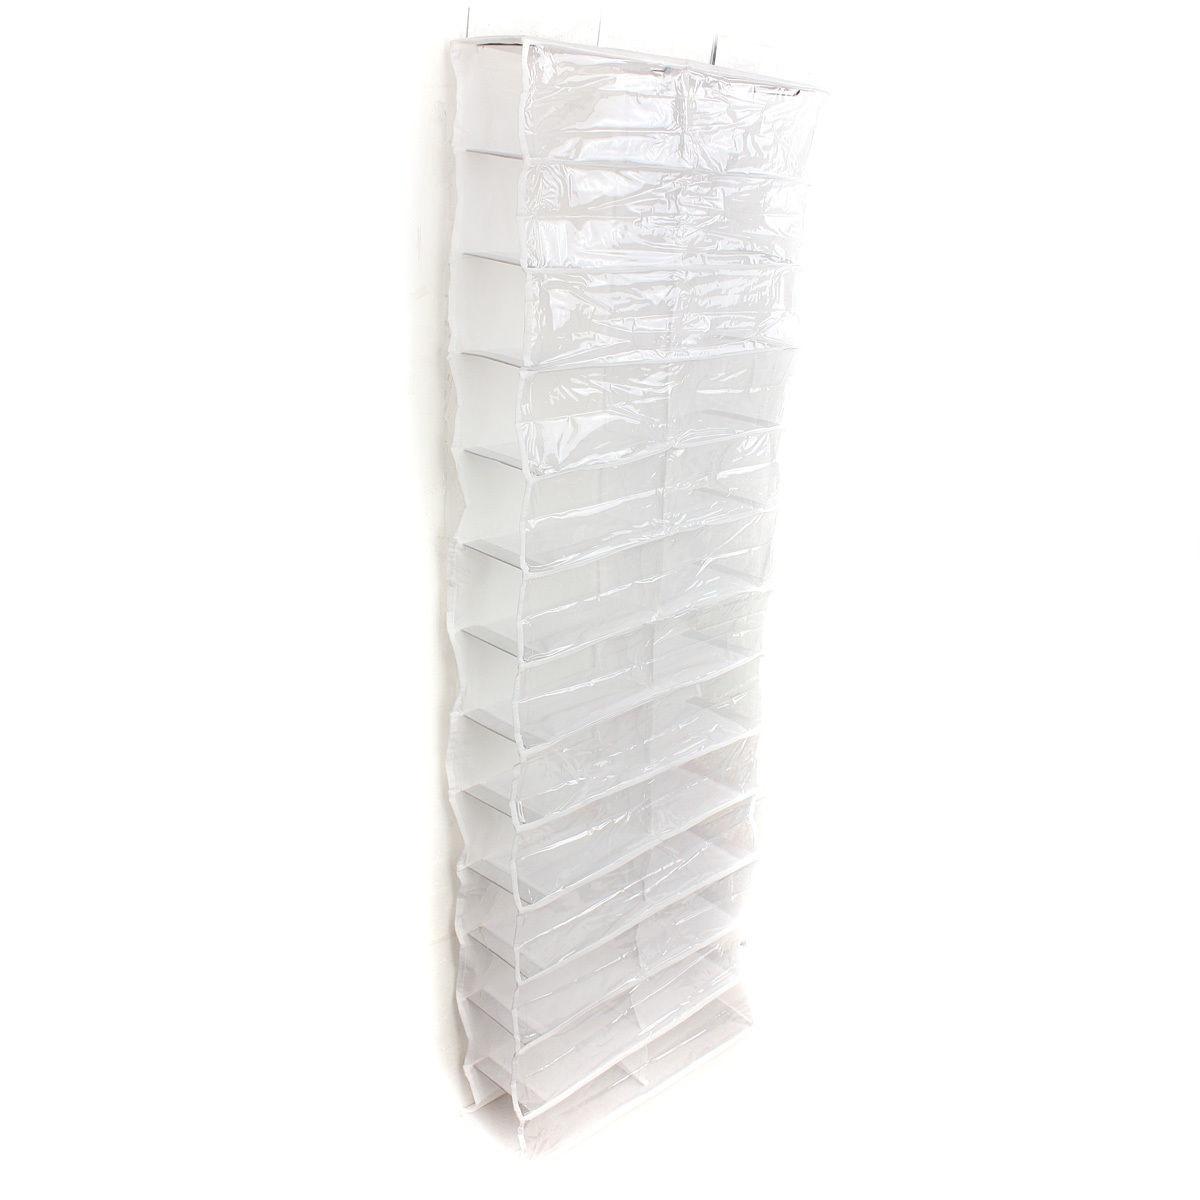 Hot Sale 26 Pairs Over Door Hanging Stand Shoe Rack Shelf Storage Organiser Pocket Holder